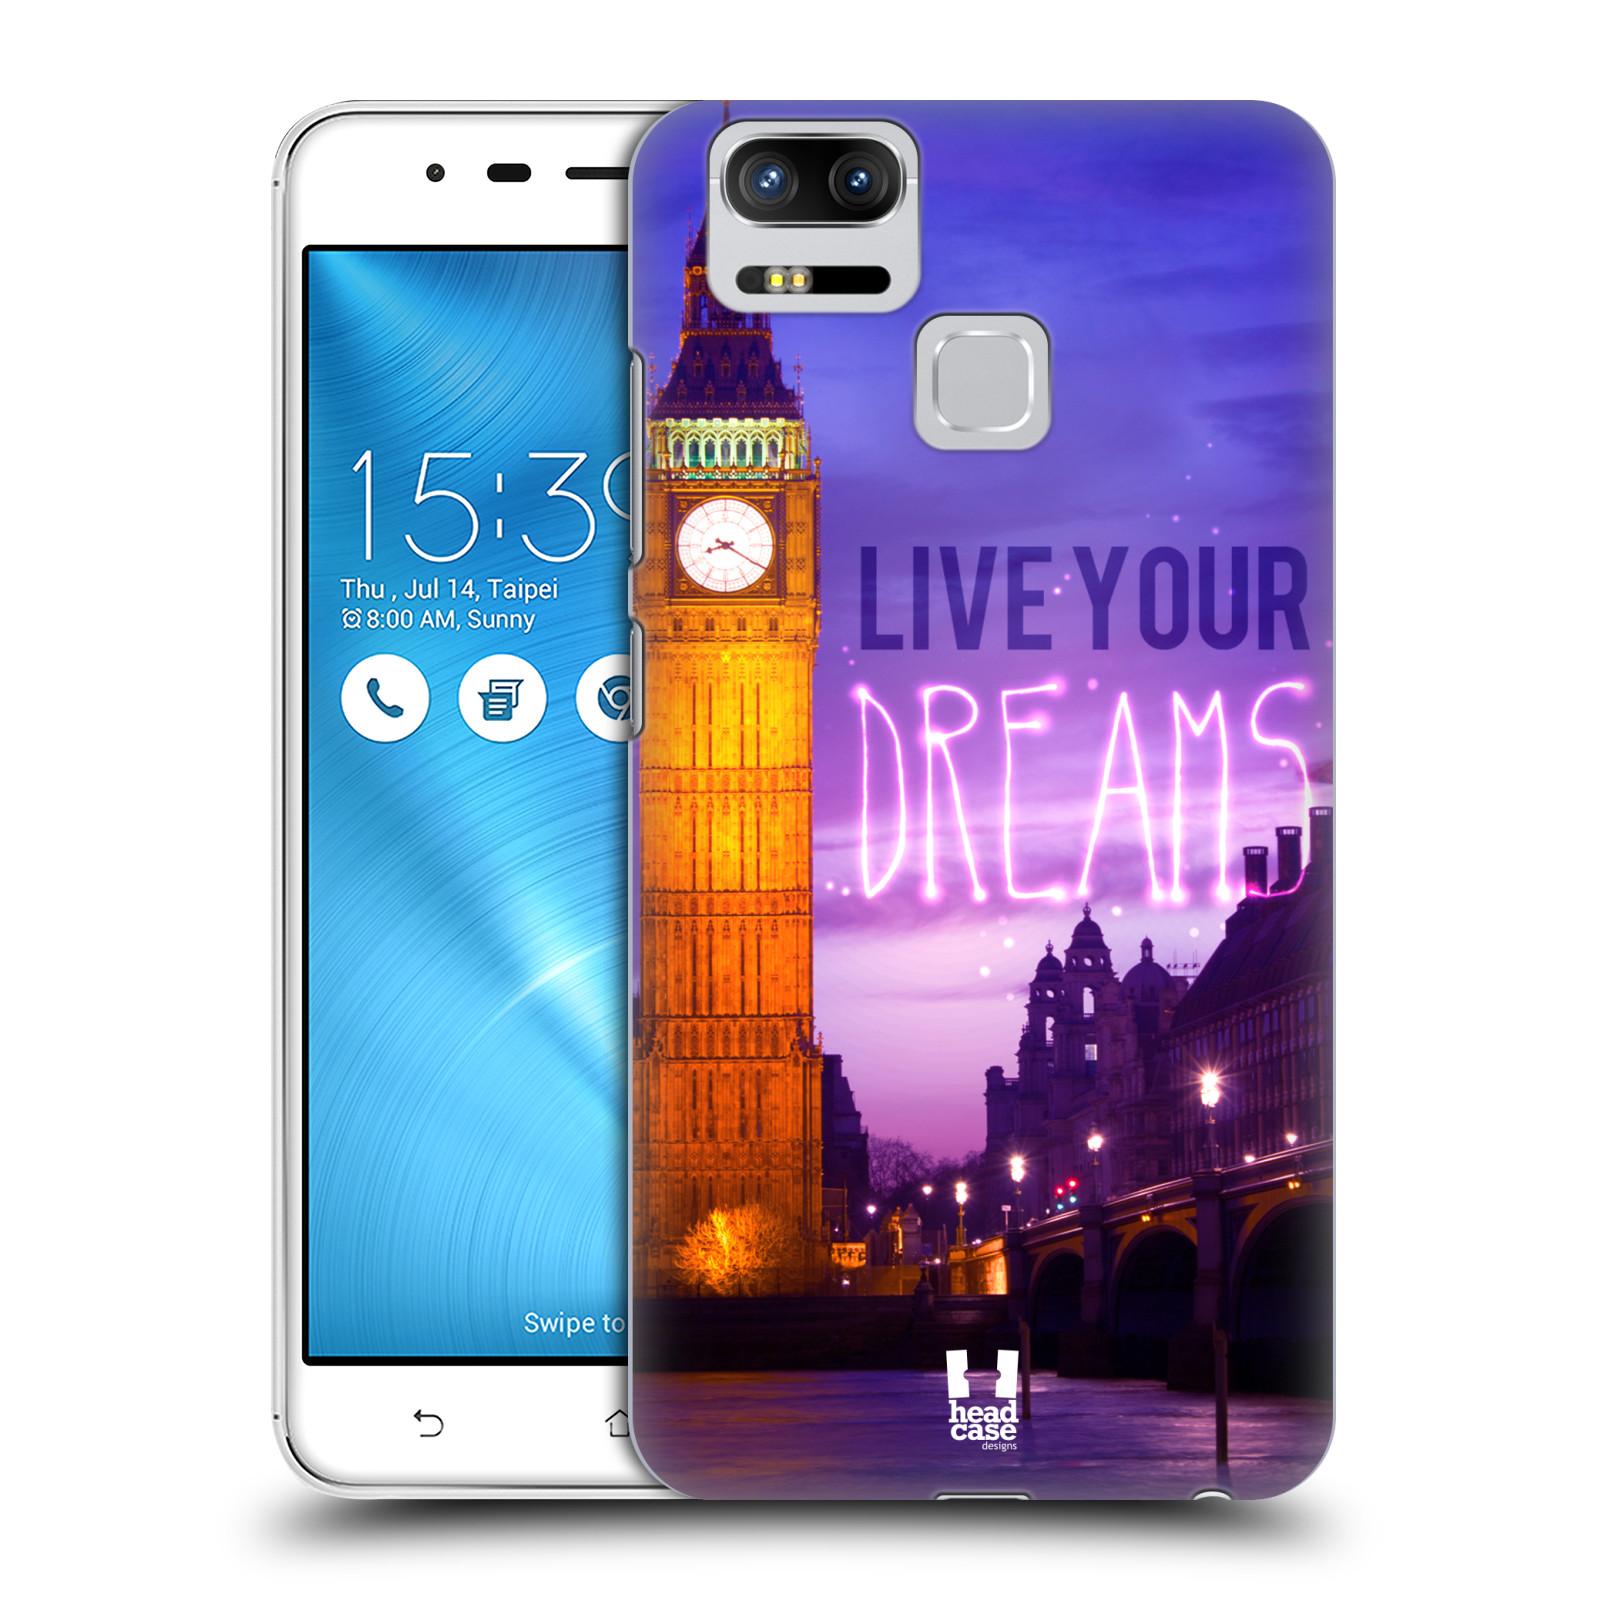 Plastové pouzdro na mobil Asus ZenFone 3 ZOOM ZE553KL - Head Case - DREAMS (Plastový kryt či obal na mobilní telefon Asus ZenFone 3 ZOOM ZE553KL s motivem DREAMS)